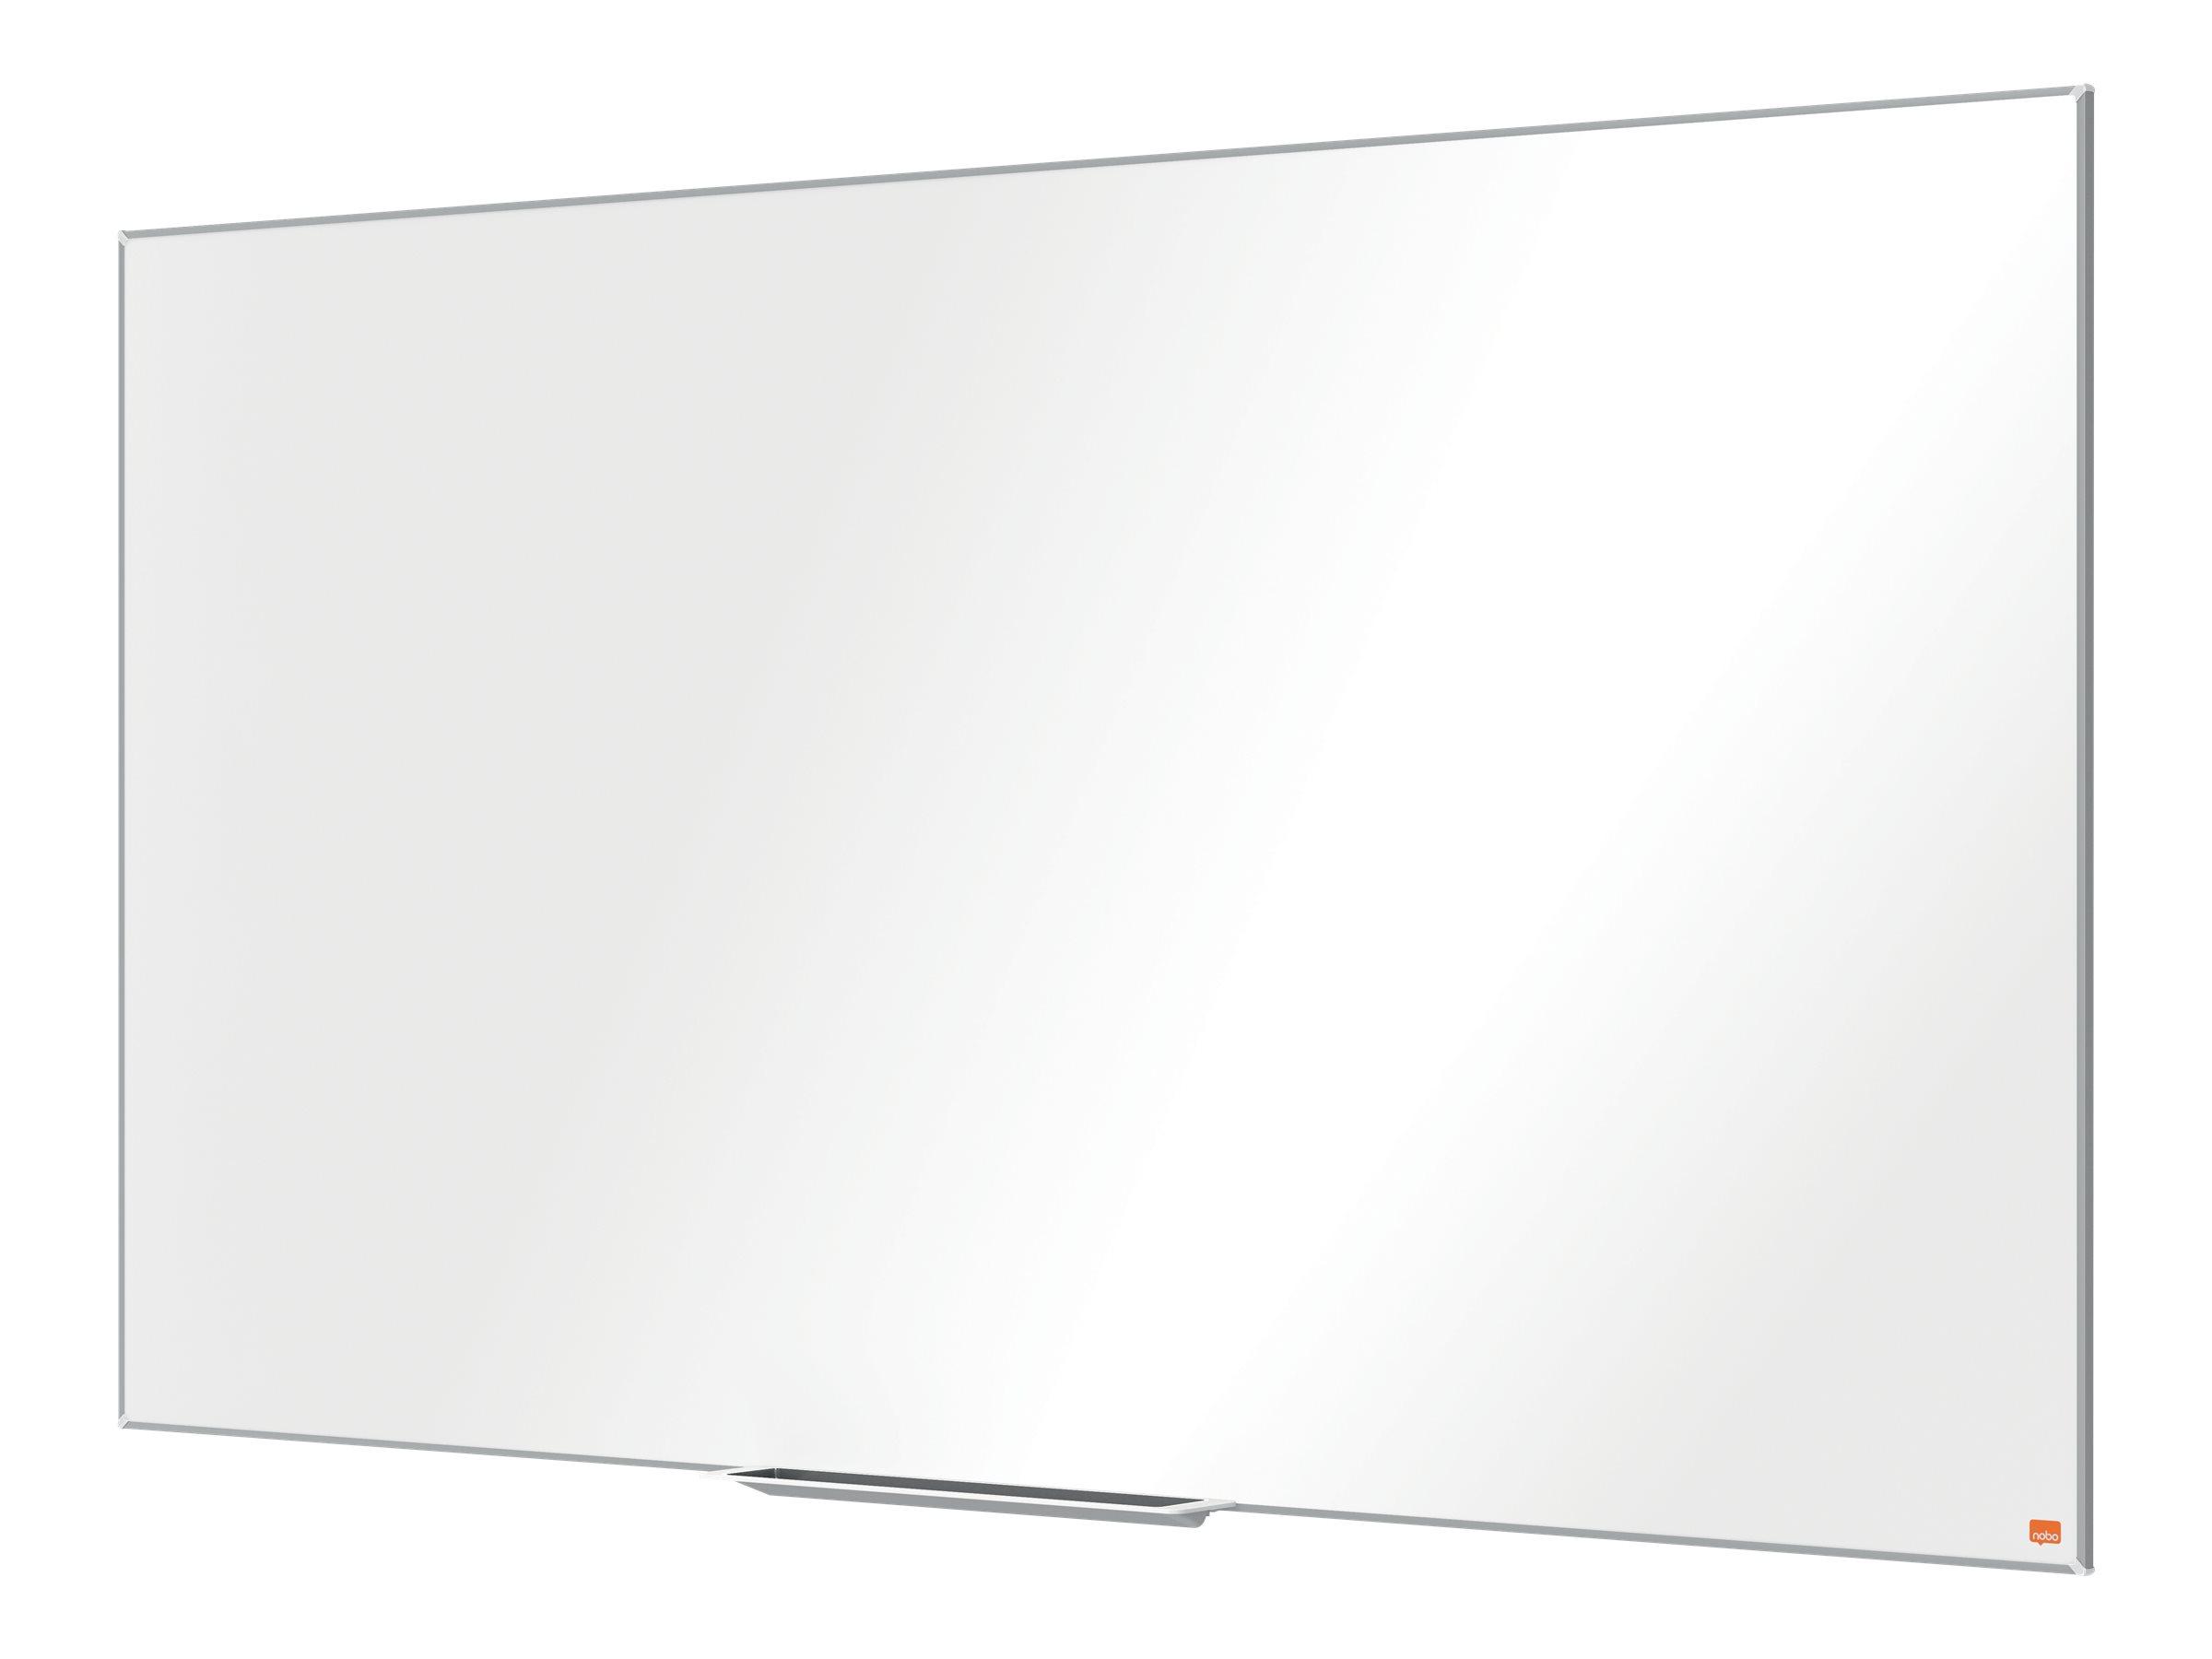 Nobo Impression Pro Widescreen 70